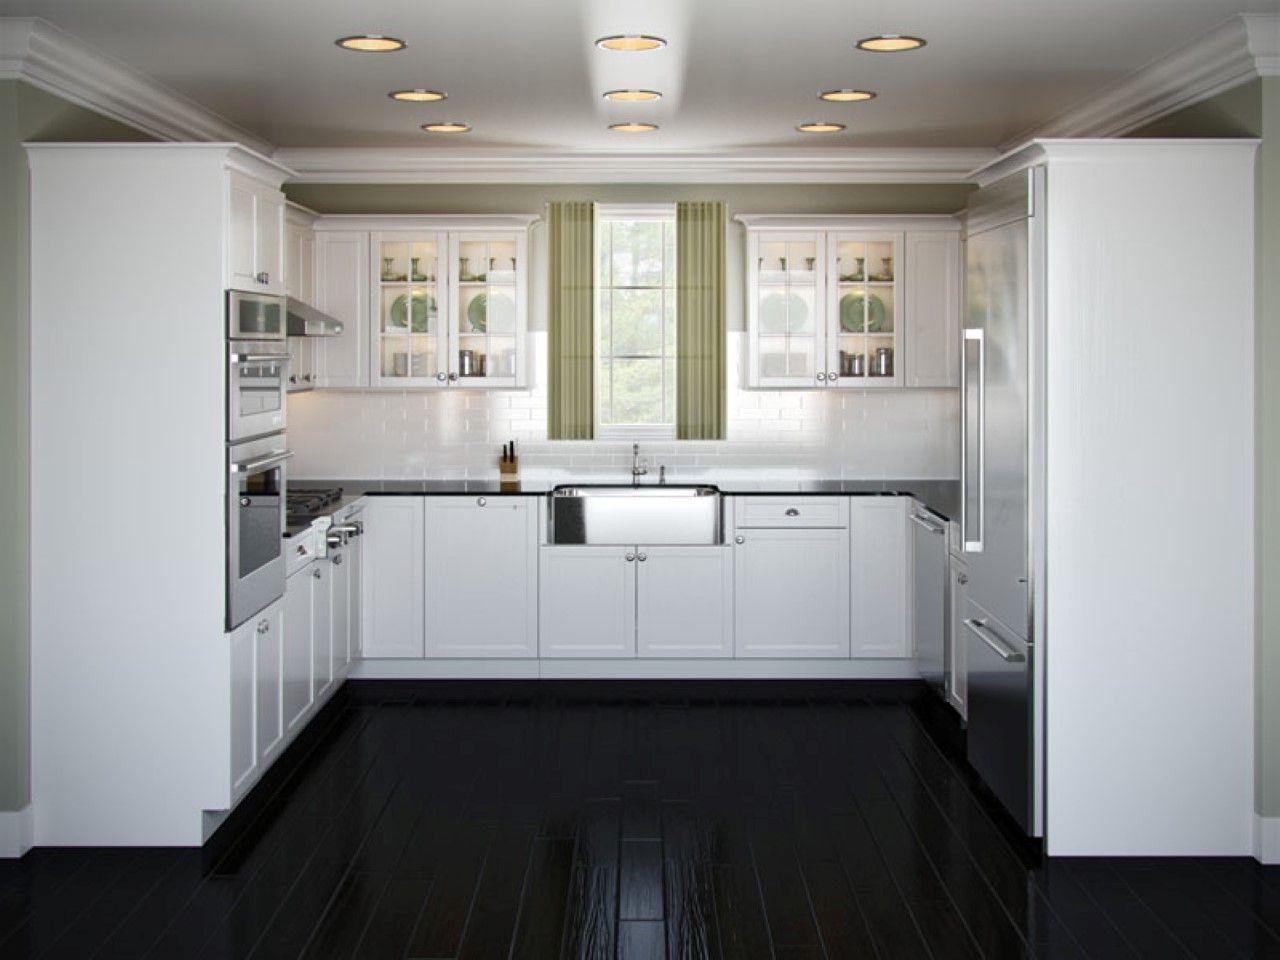 Attractive Black Kitchen Flooring Ideas Part - 4: New U Shaped Kitchen Design White Cabinets And Black Floor